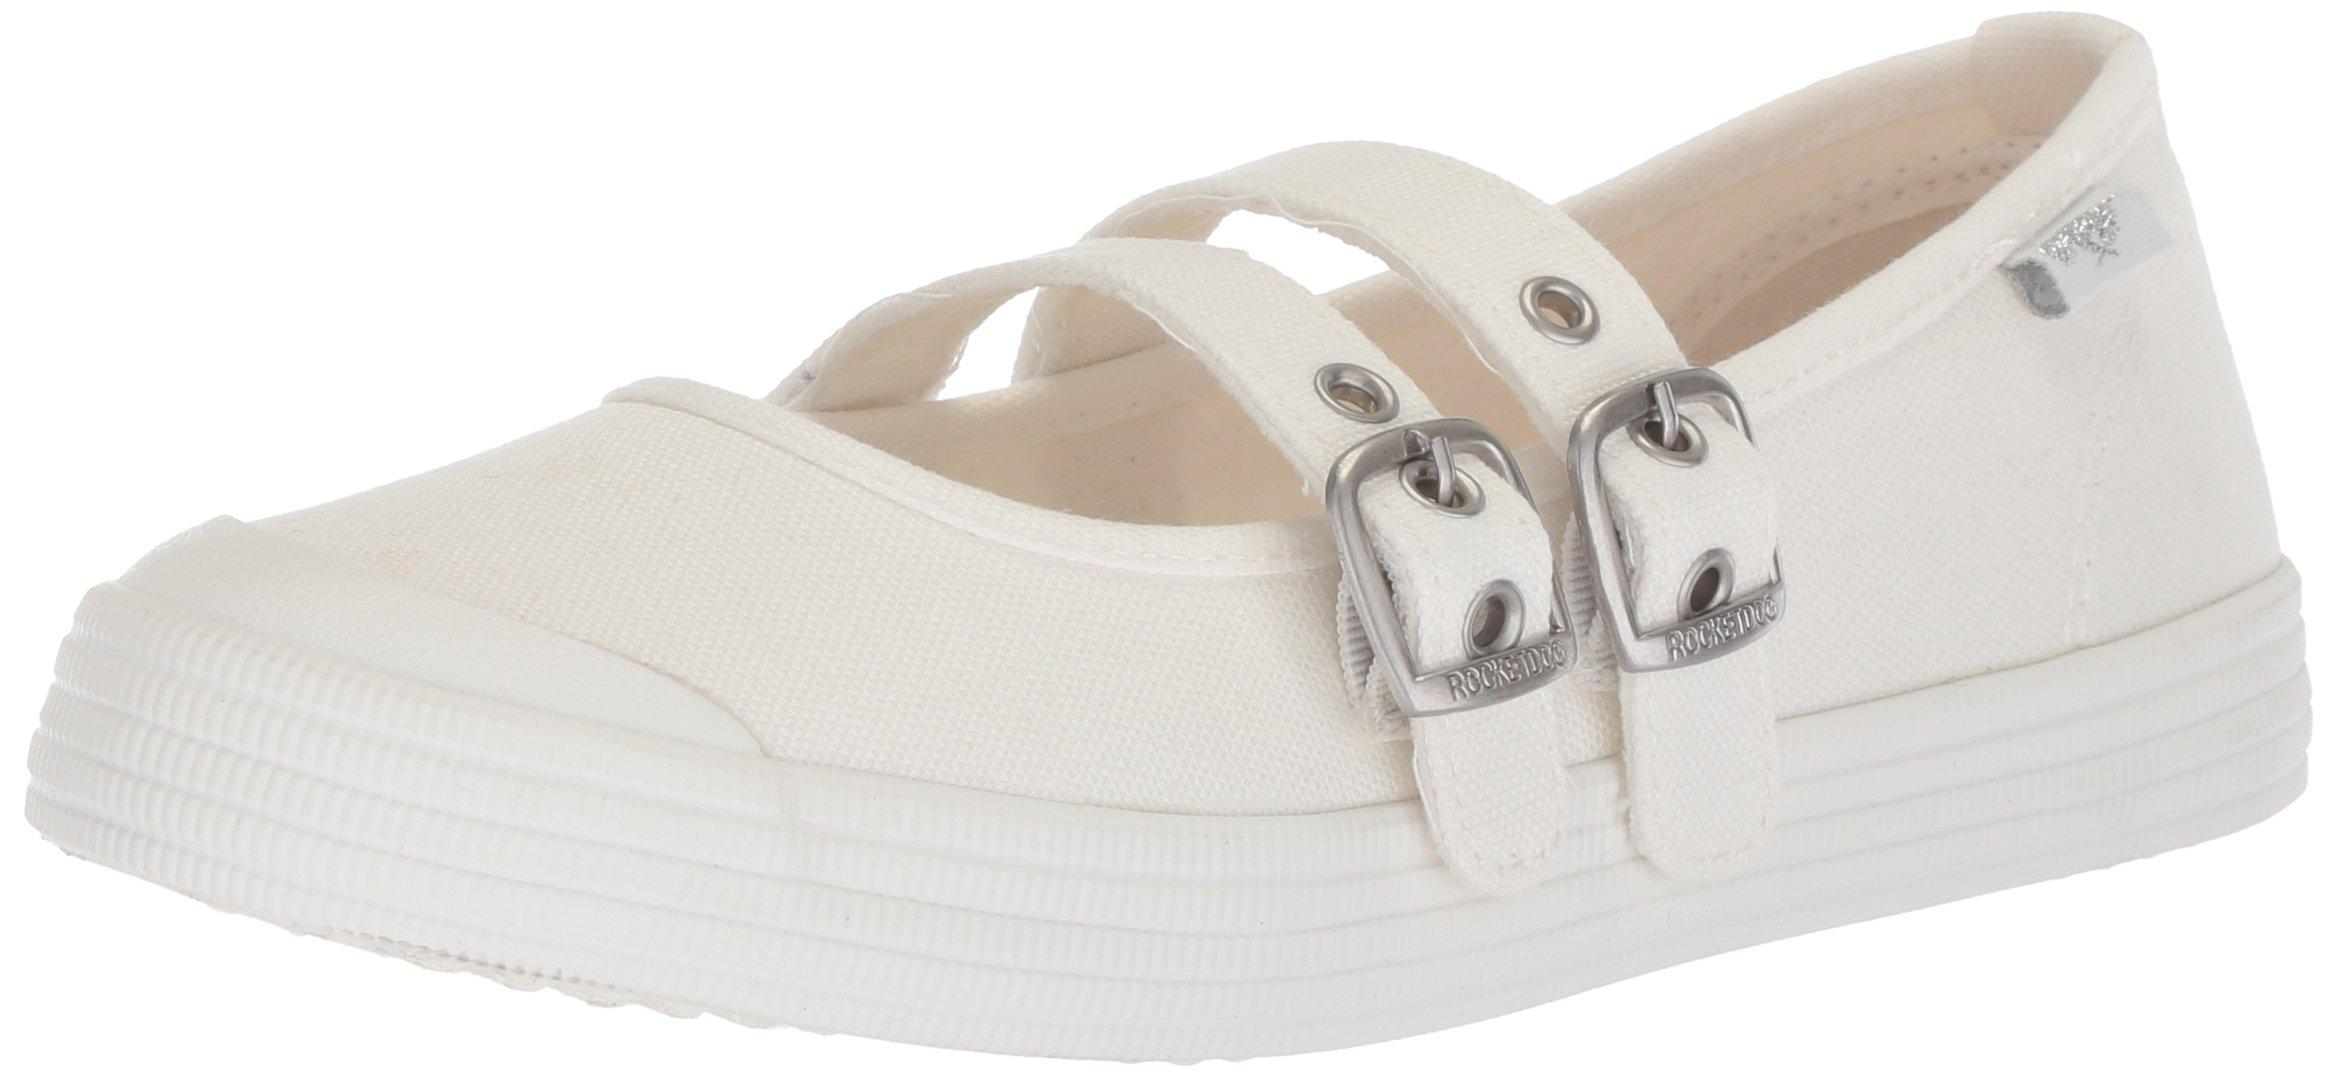 Rocket Dog Women's Coolit 8A Canvas Cotton Sneaker, White, 8 Medium US